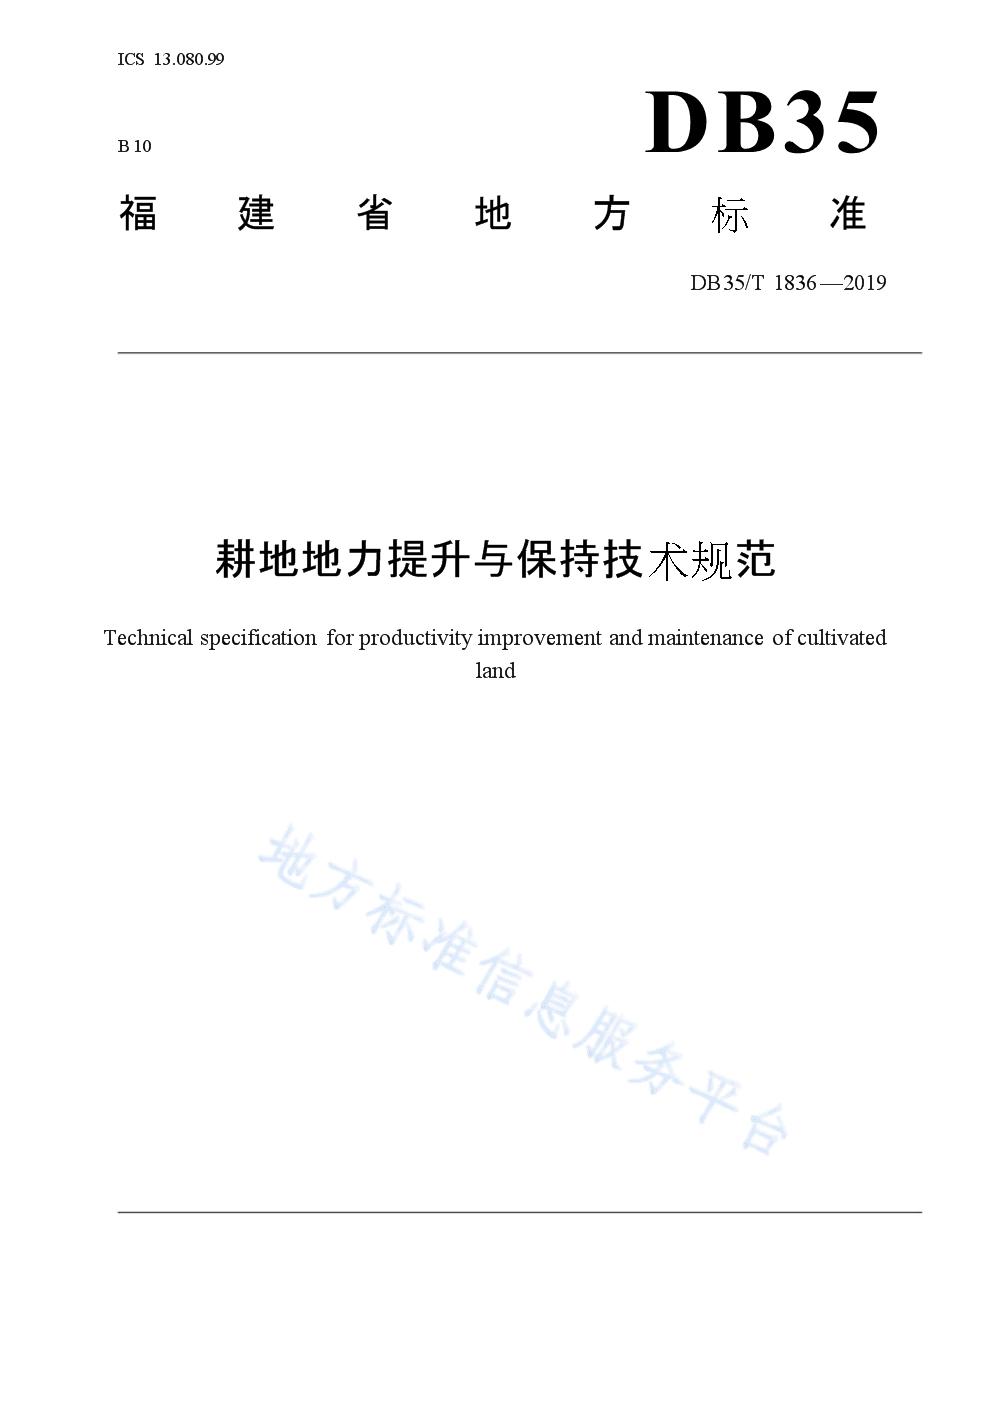 DB35_T 1836-2019耕地地力提升与保持技术规范.docx